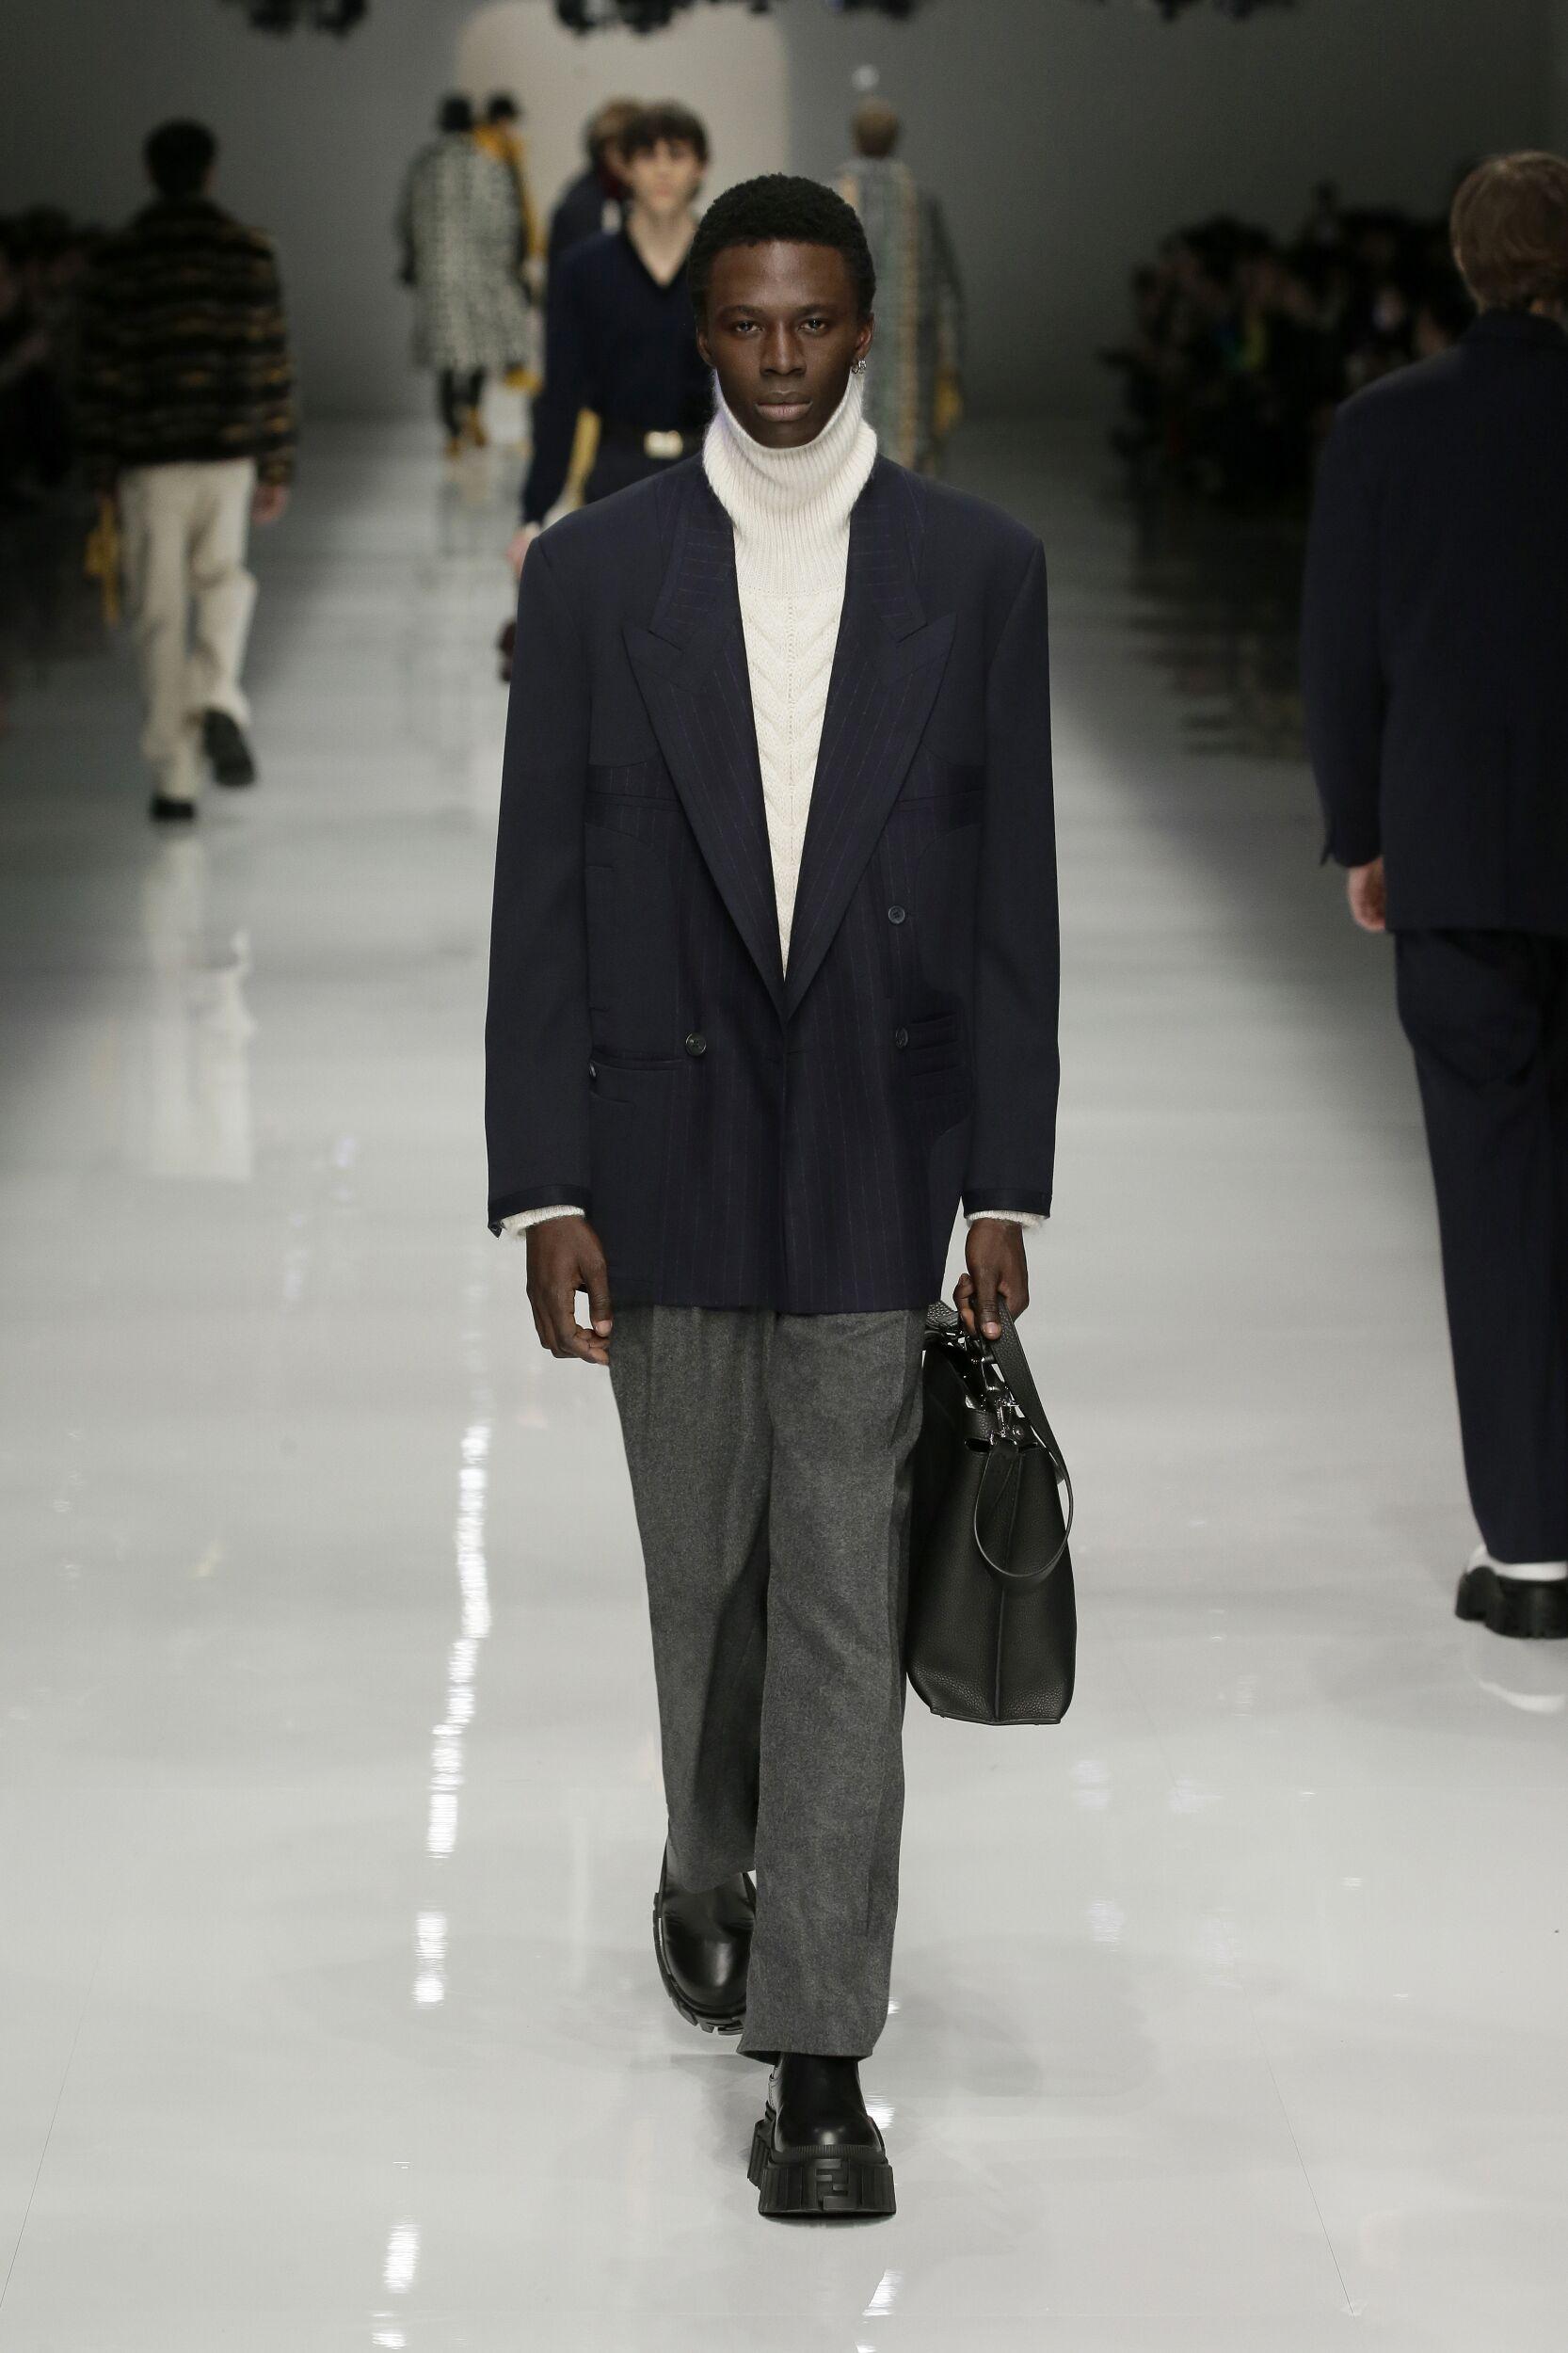 2020 Catwalk Fendi Man Fashion Show Winter